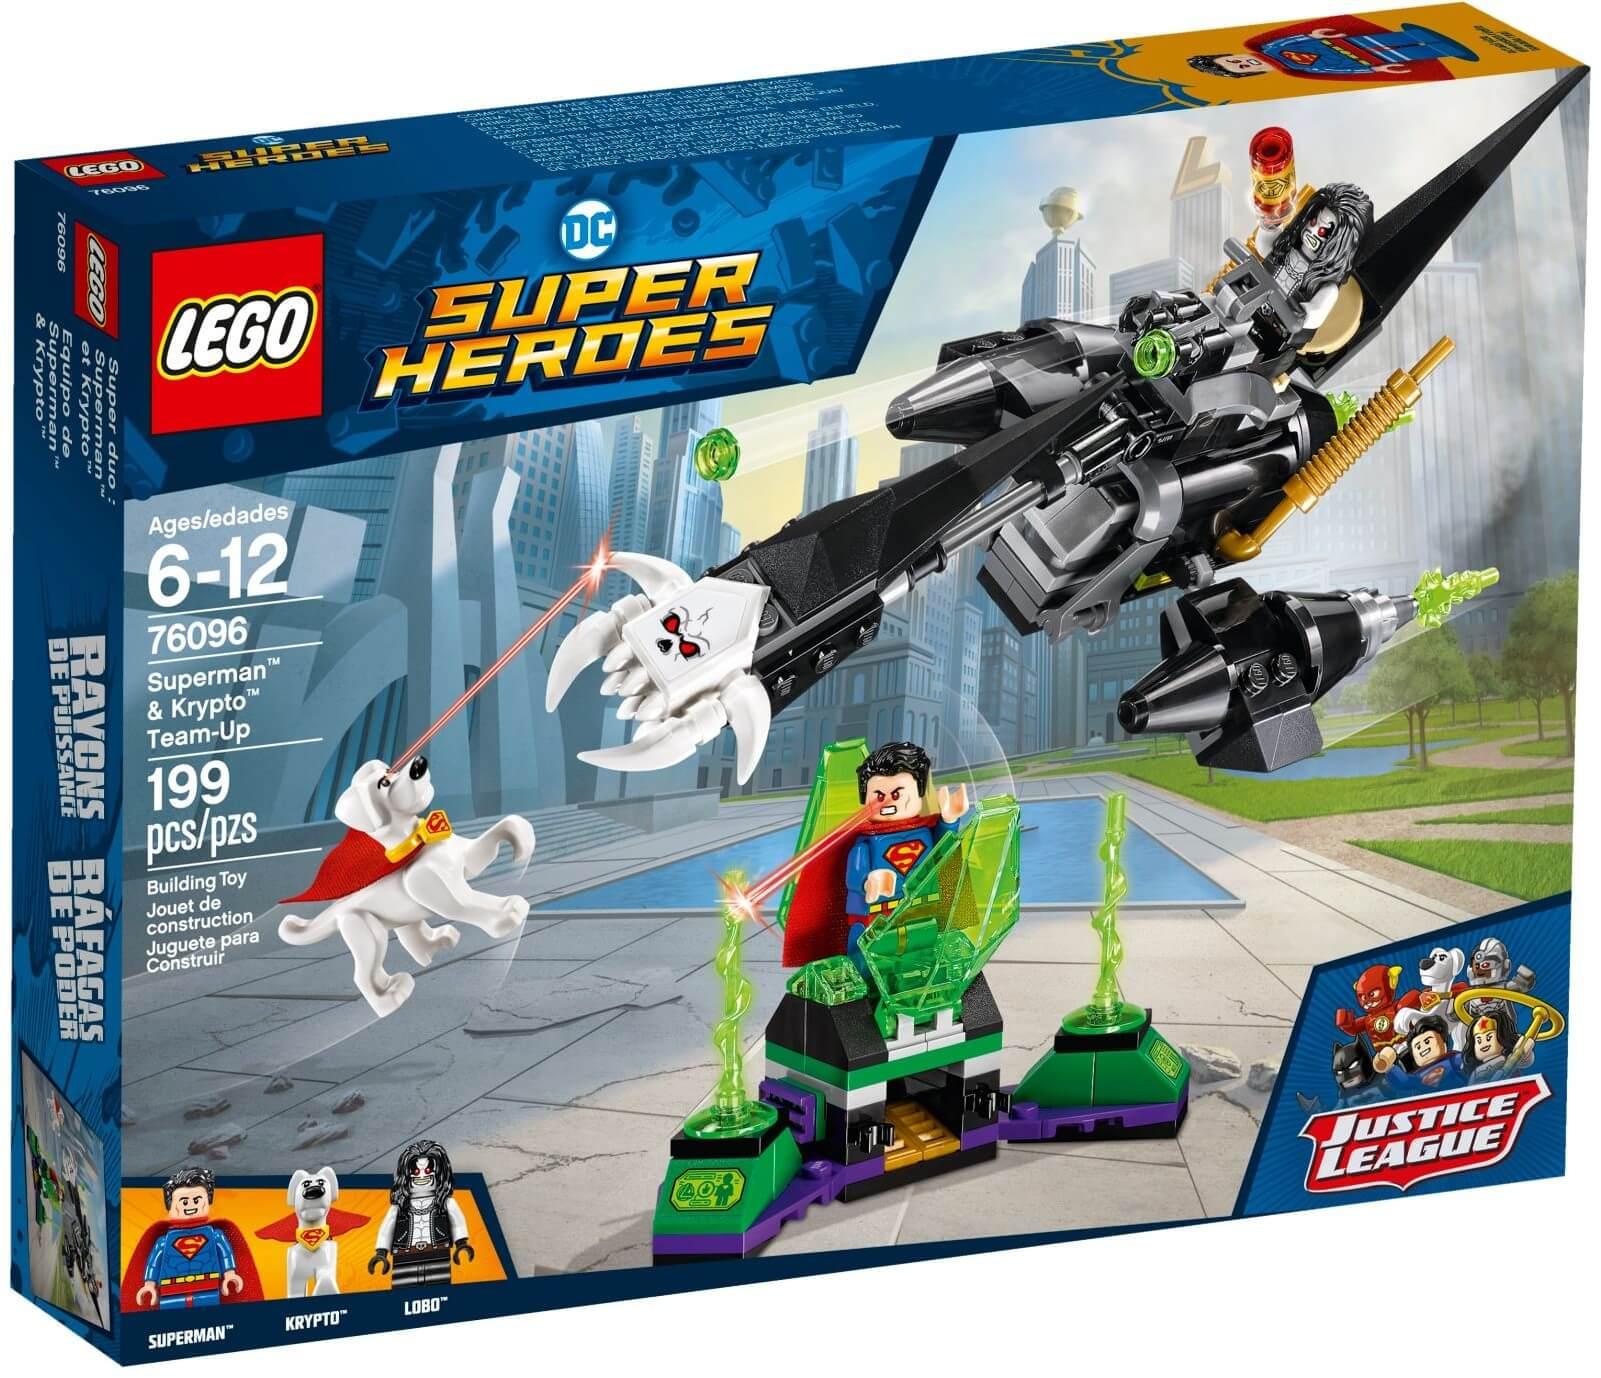 Mua đồ chơi LEGO 76096 - LEGO DC Comics Super Heroes 76096 - Superman và chú chó Krypto (LEGO DC Comics Super Heroes 76096 Superman & Krypto Team-Up)